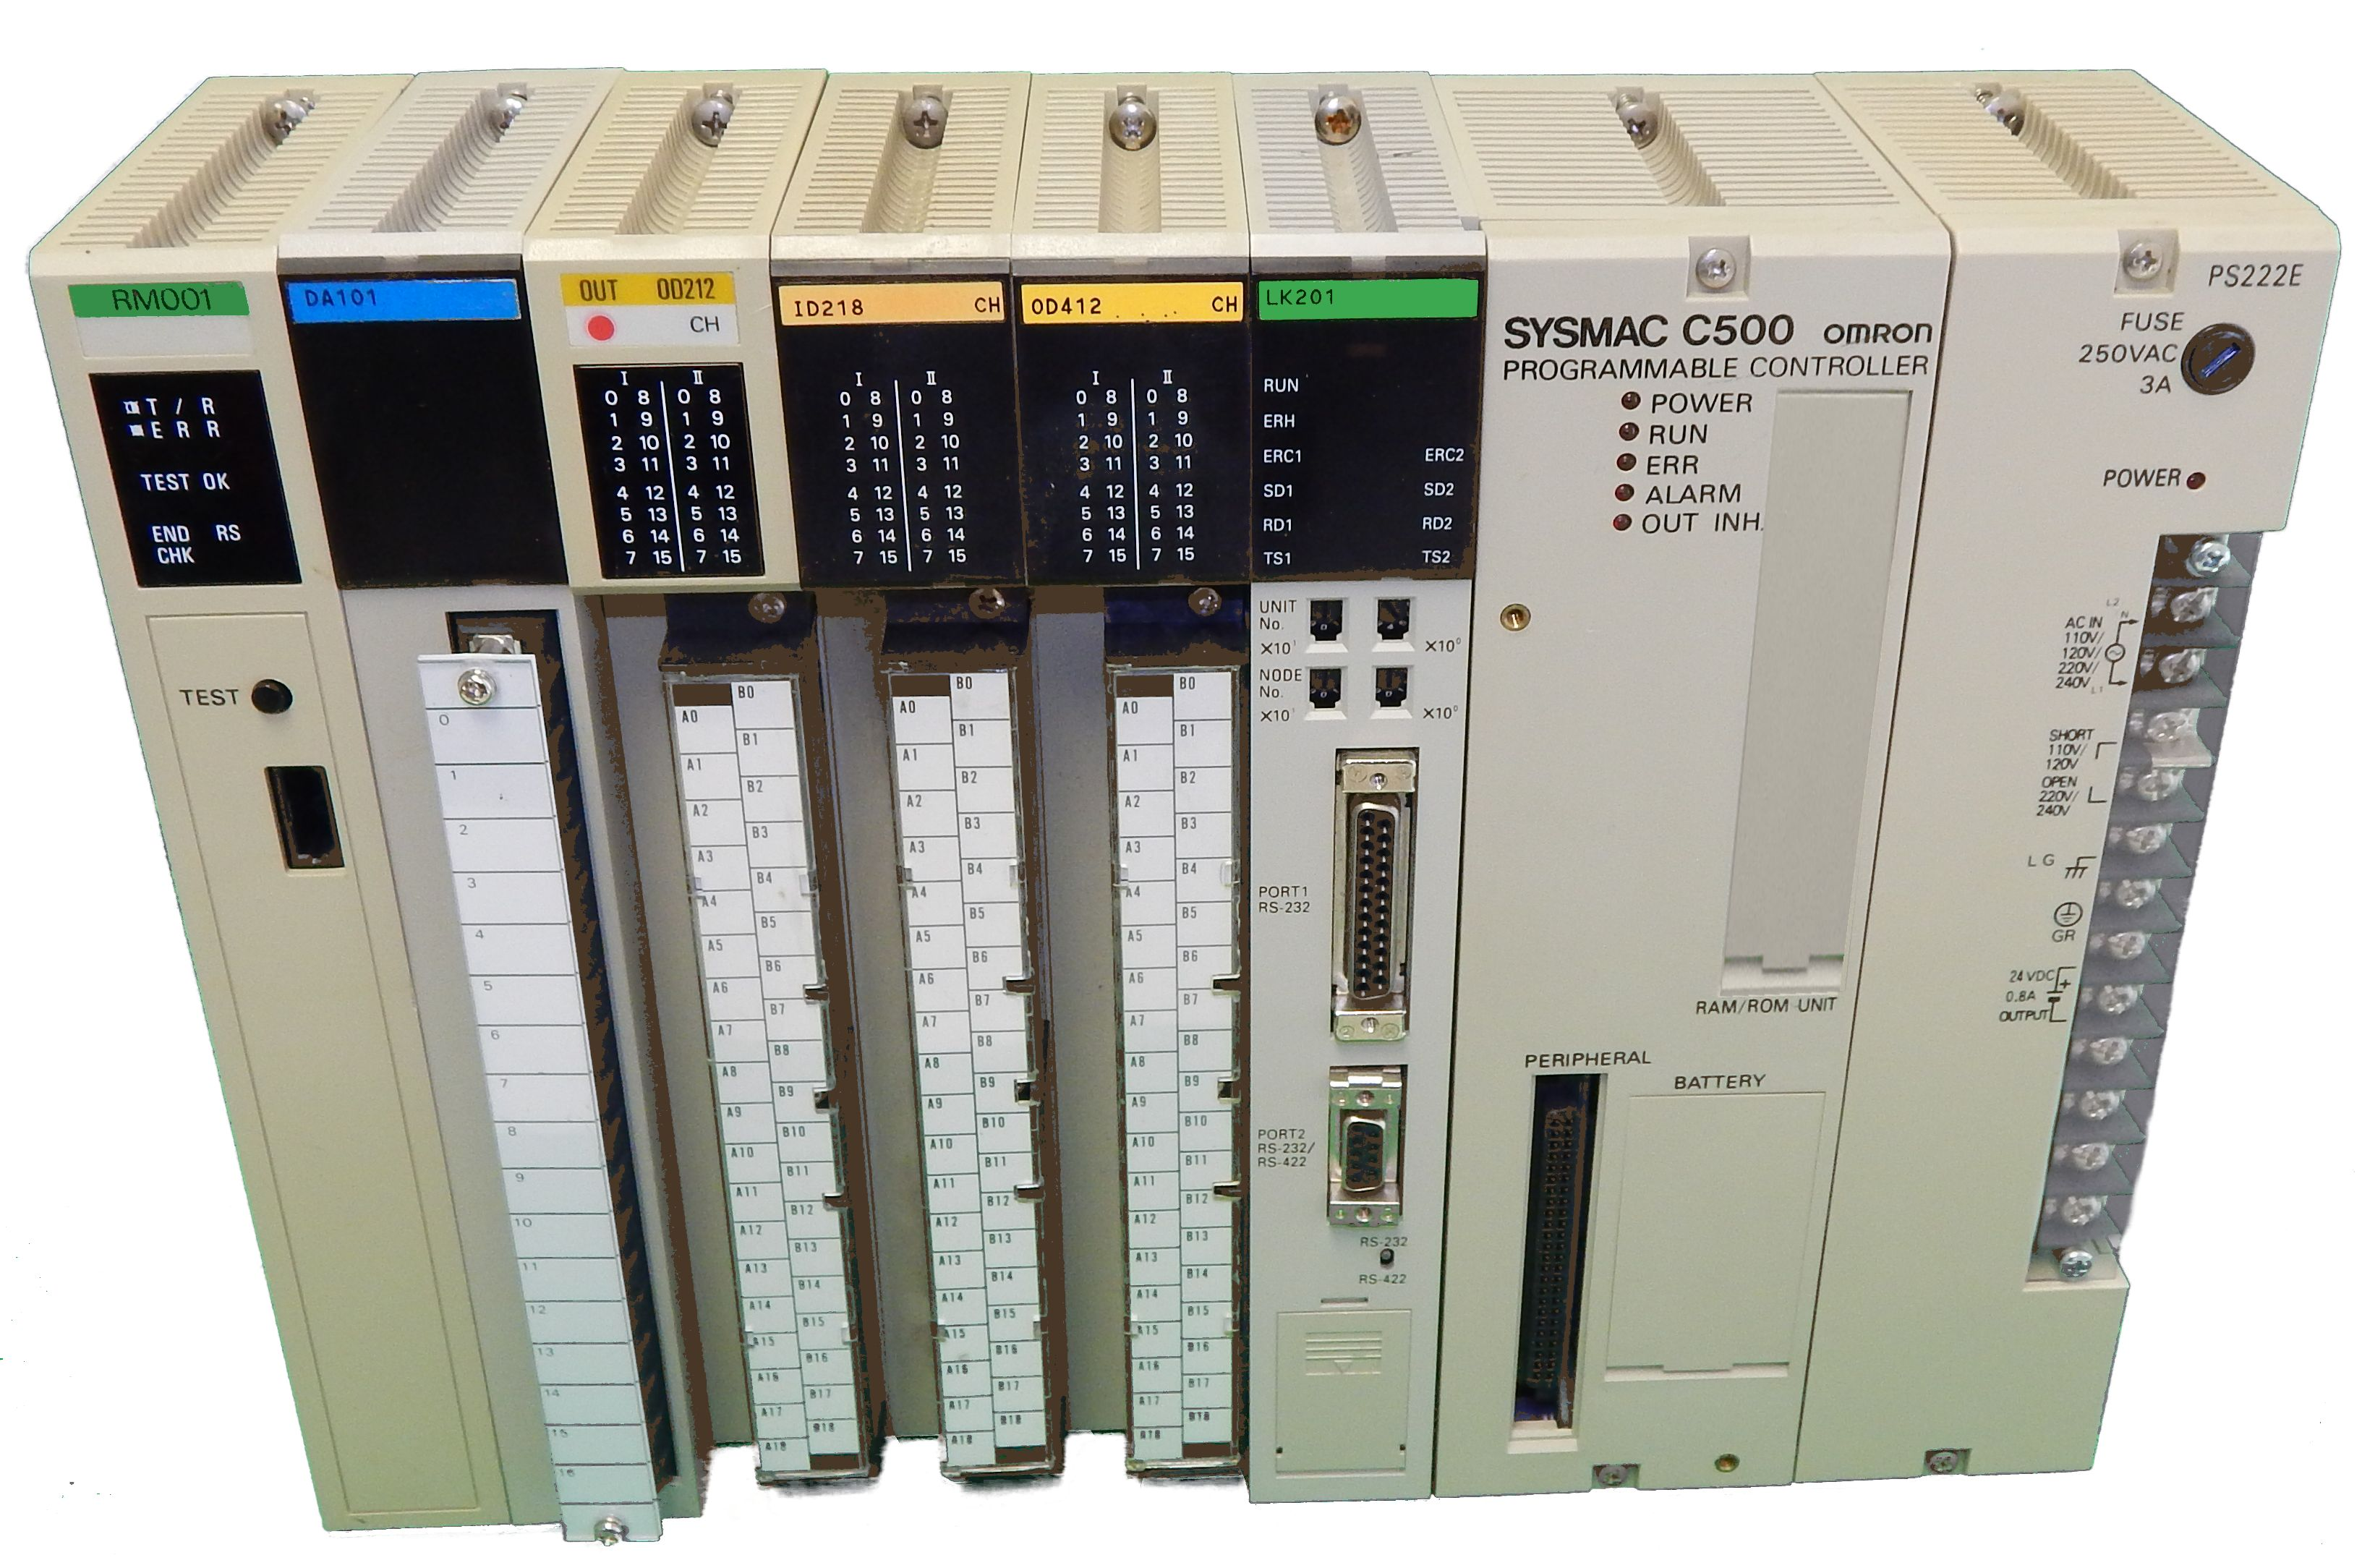 3G2C7-CPU73-E